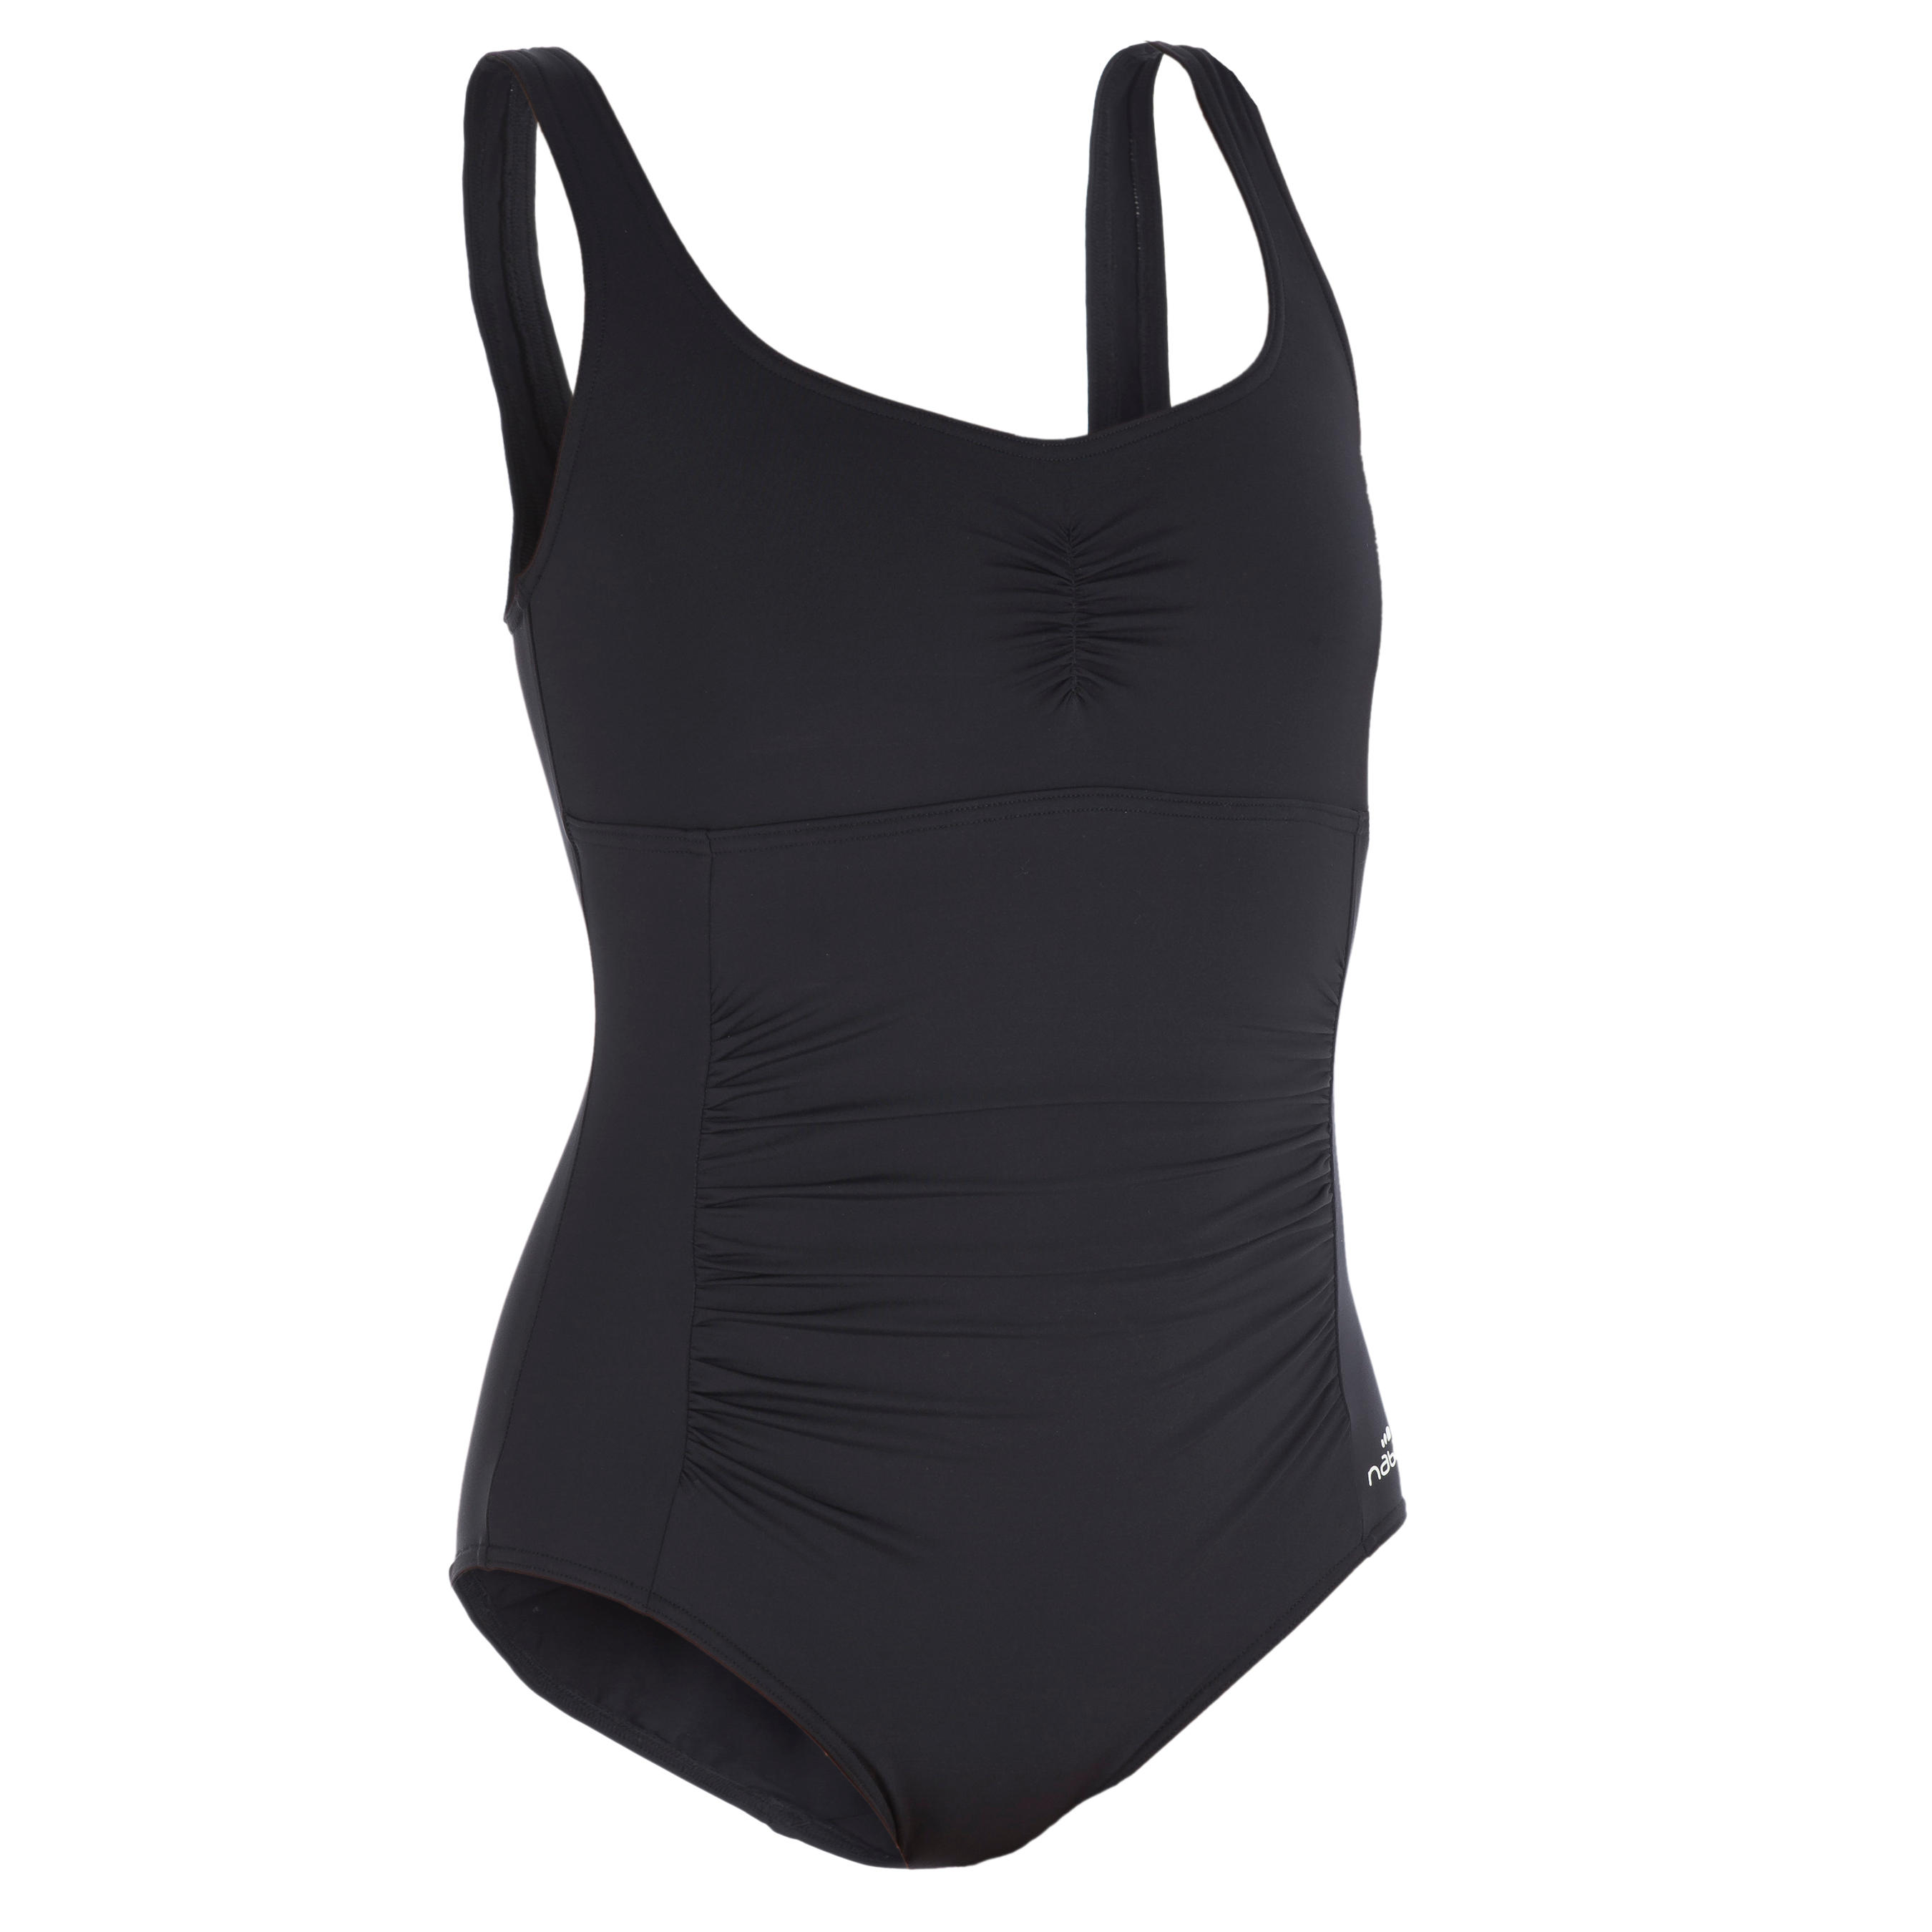 Mary One-Piece Women's Body-Sculpting Aquafitness Swimsuit - Black